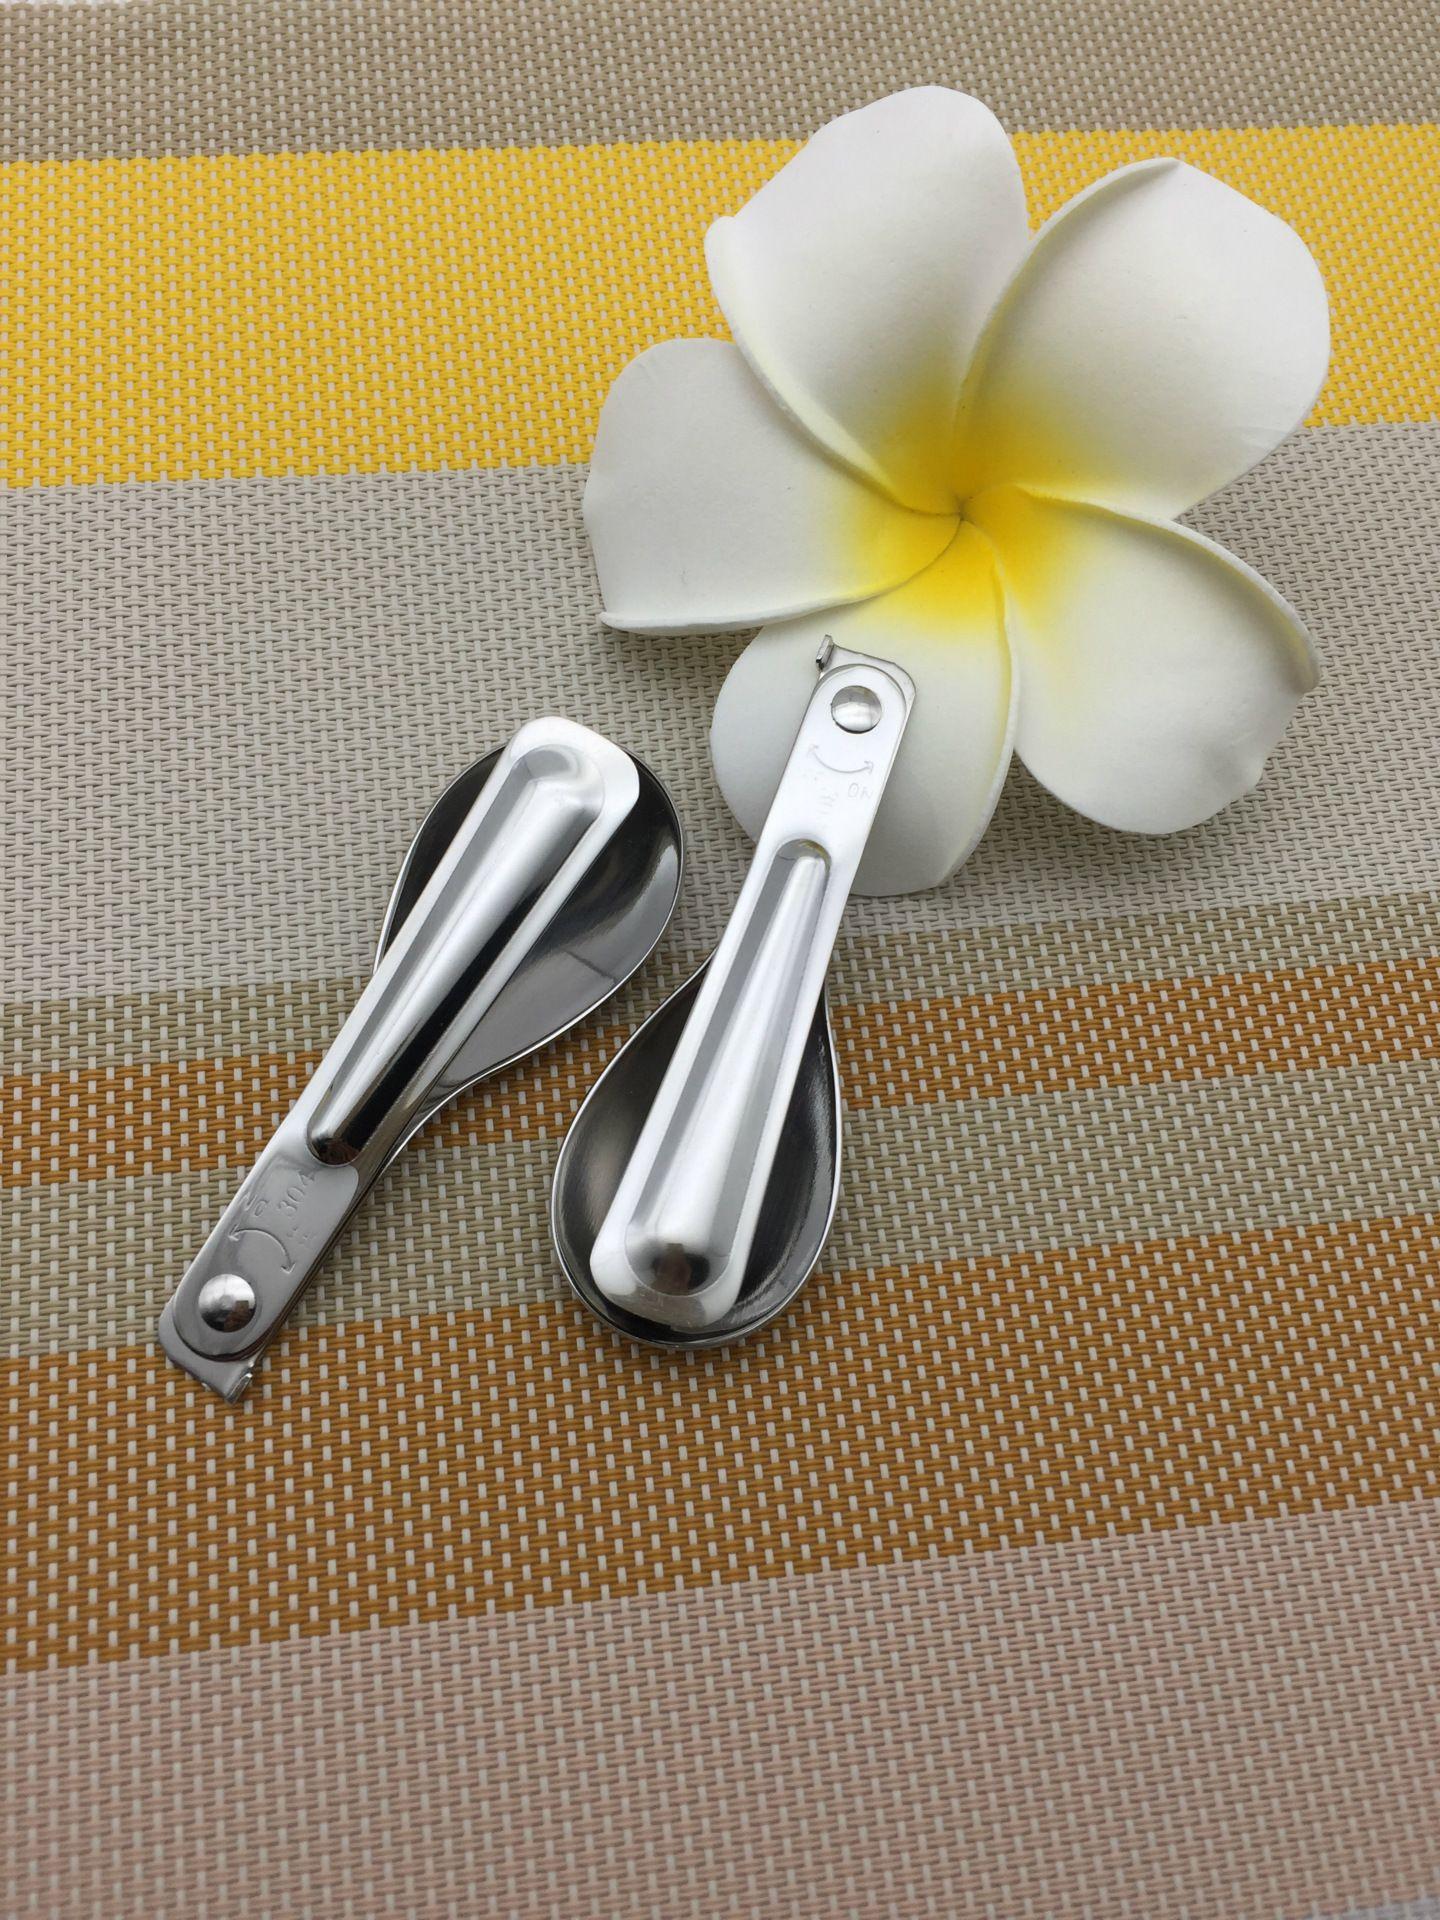 Cucchiaio pieghevole da tavola in acciaio inox 304 Cucchiaino da picnic pieghevole pieghevole